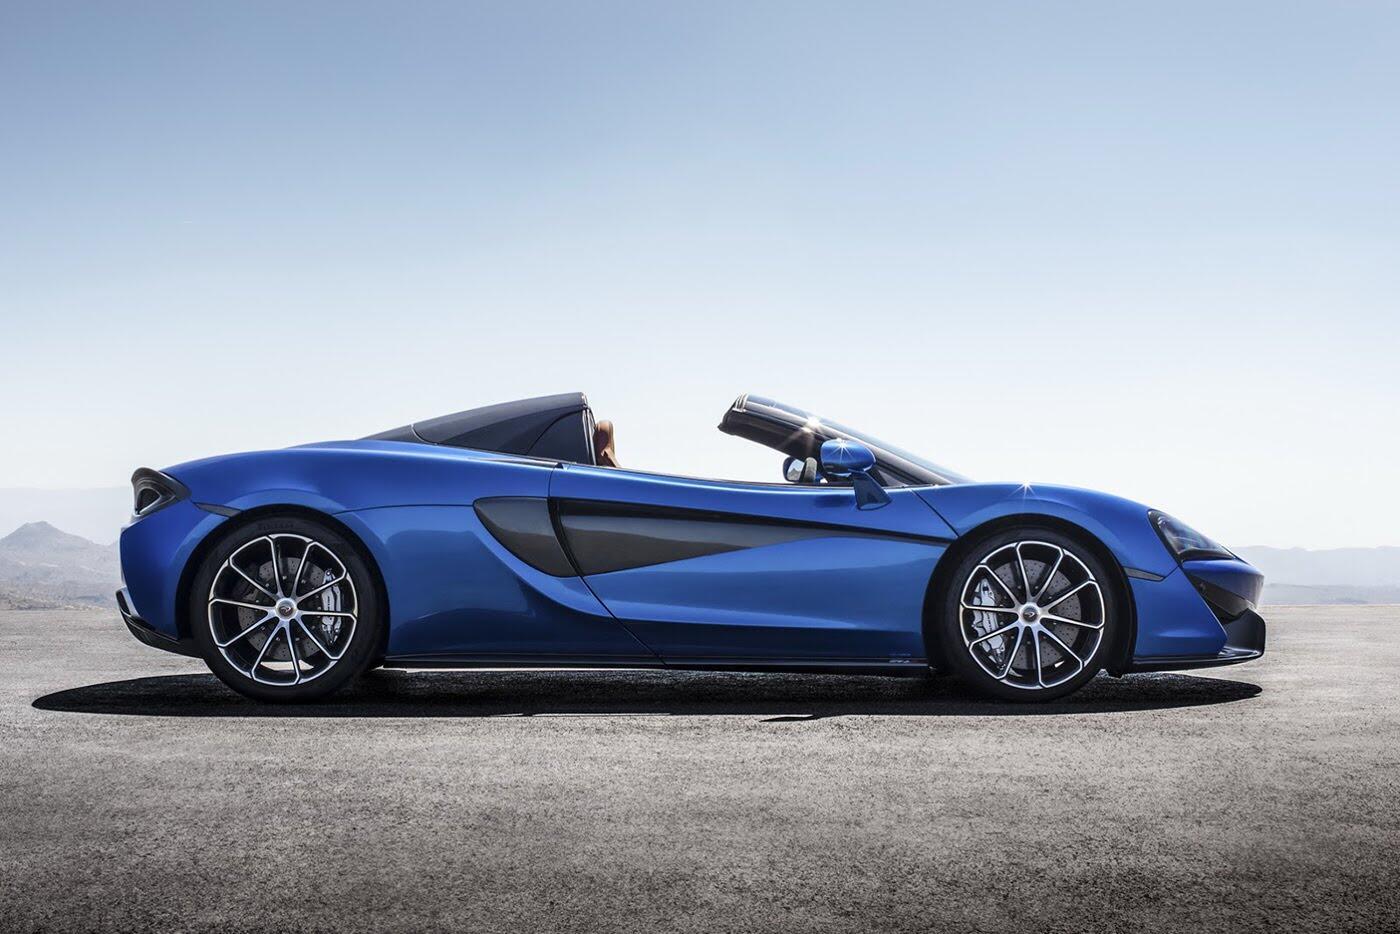 Siêu xe McLaren 570S Spider sắp ra mắt - Hình 3